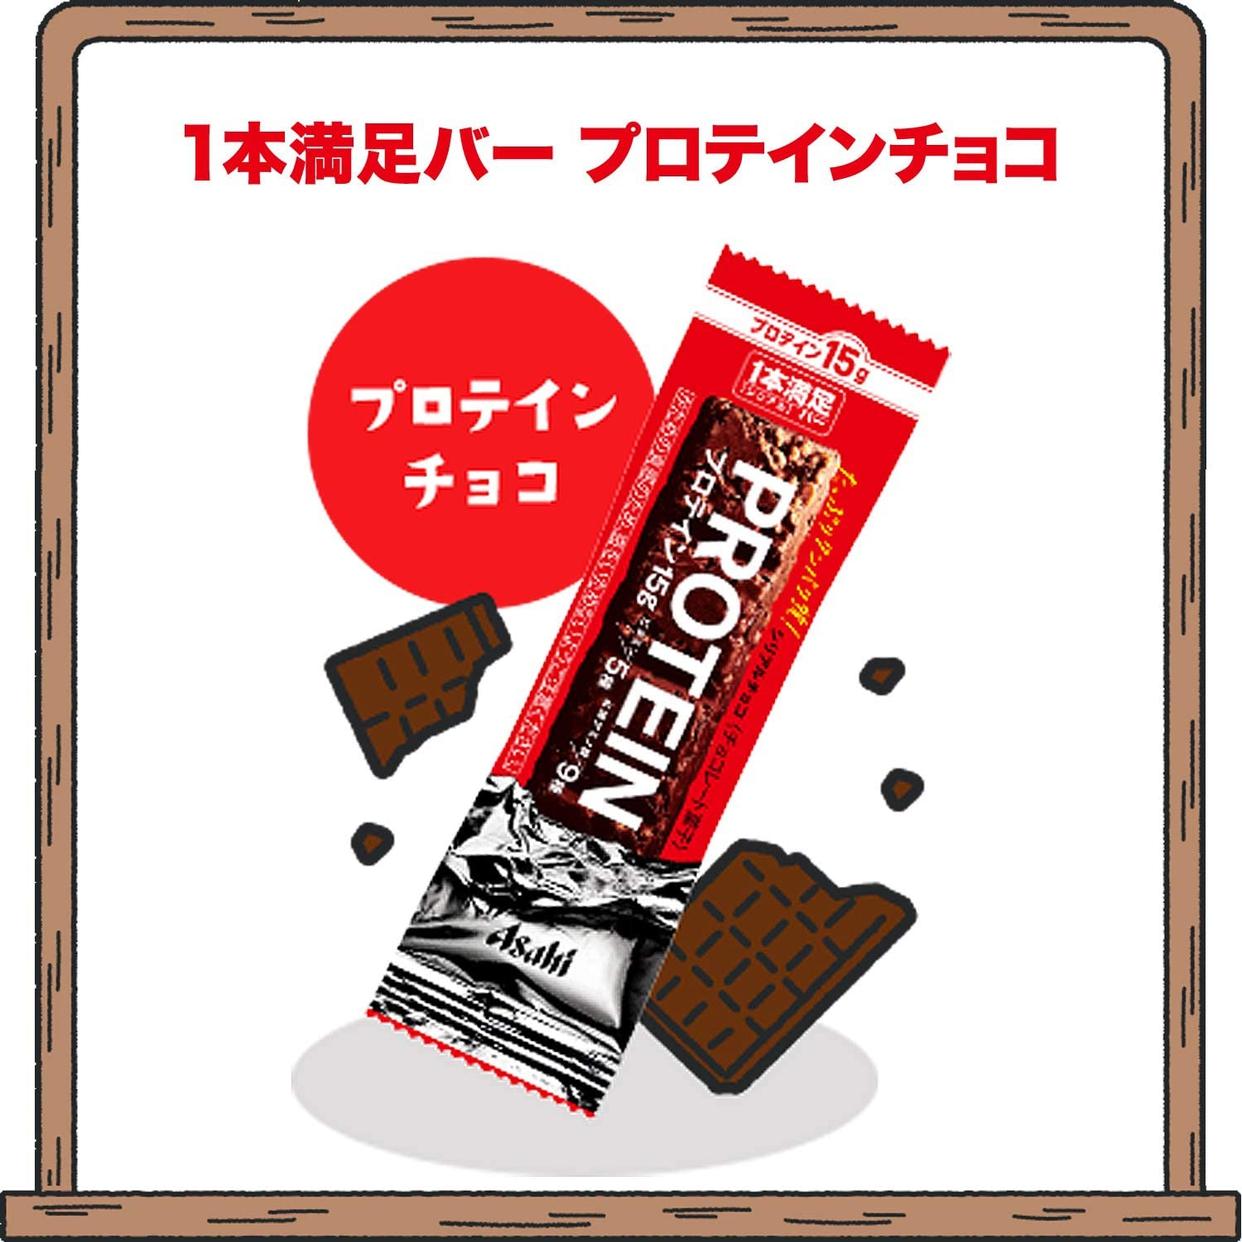 Asahi(アサヒグループショクヒン) 1本満足バープロテインの商品画像2